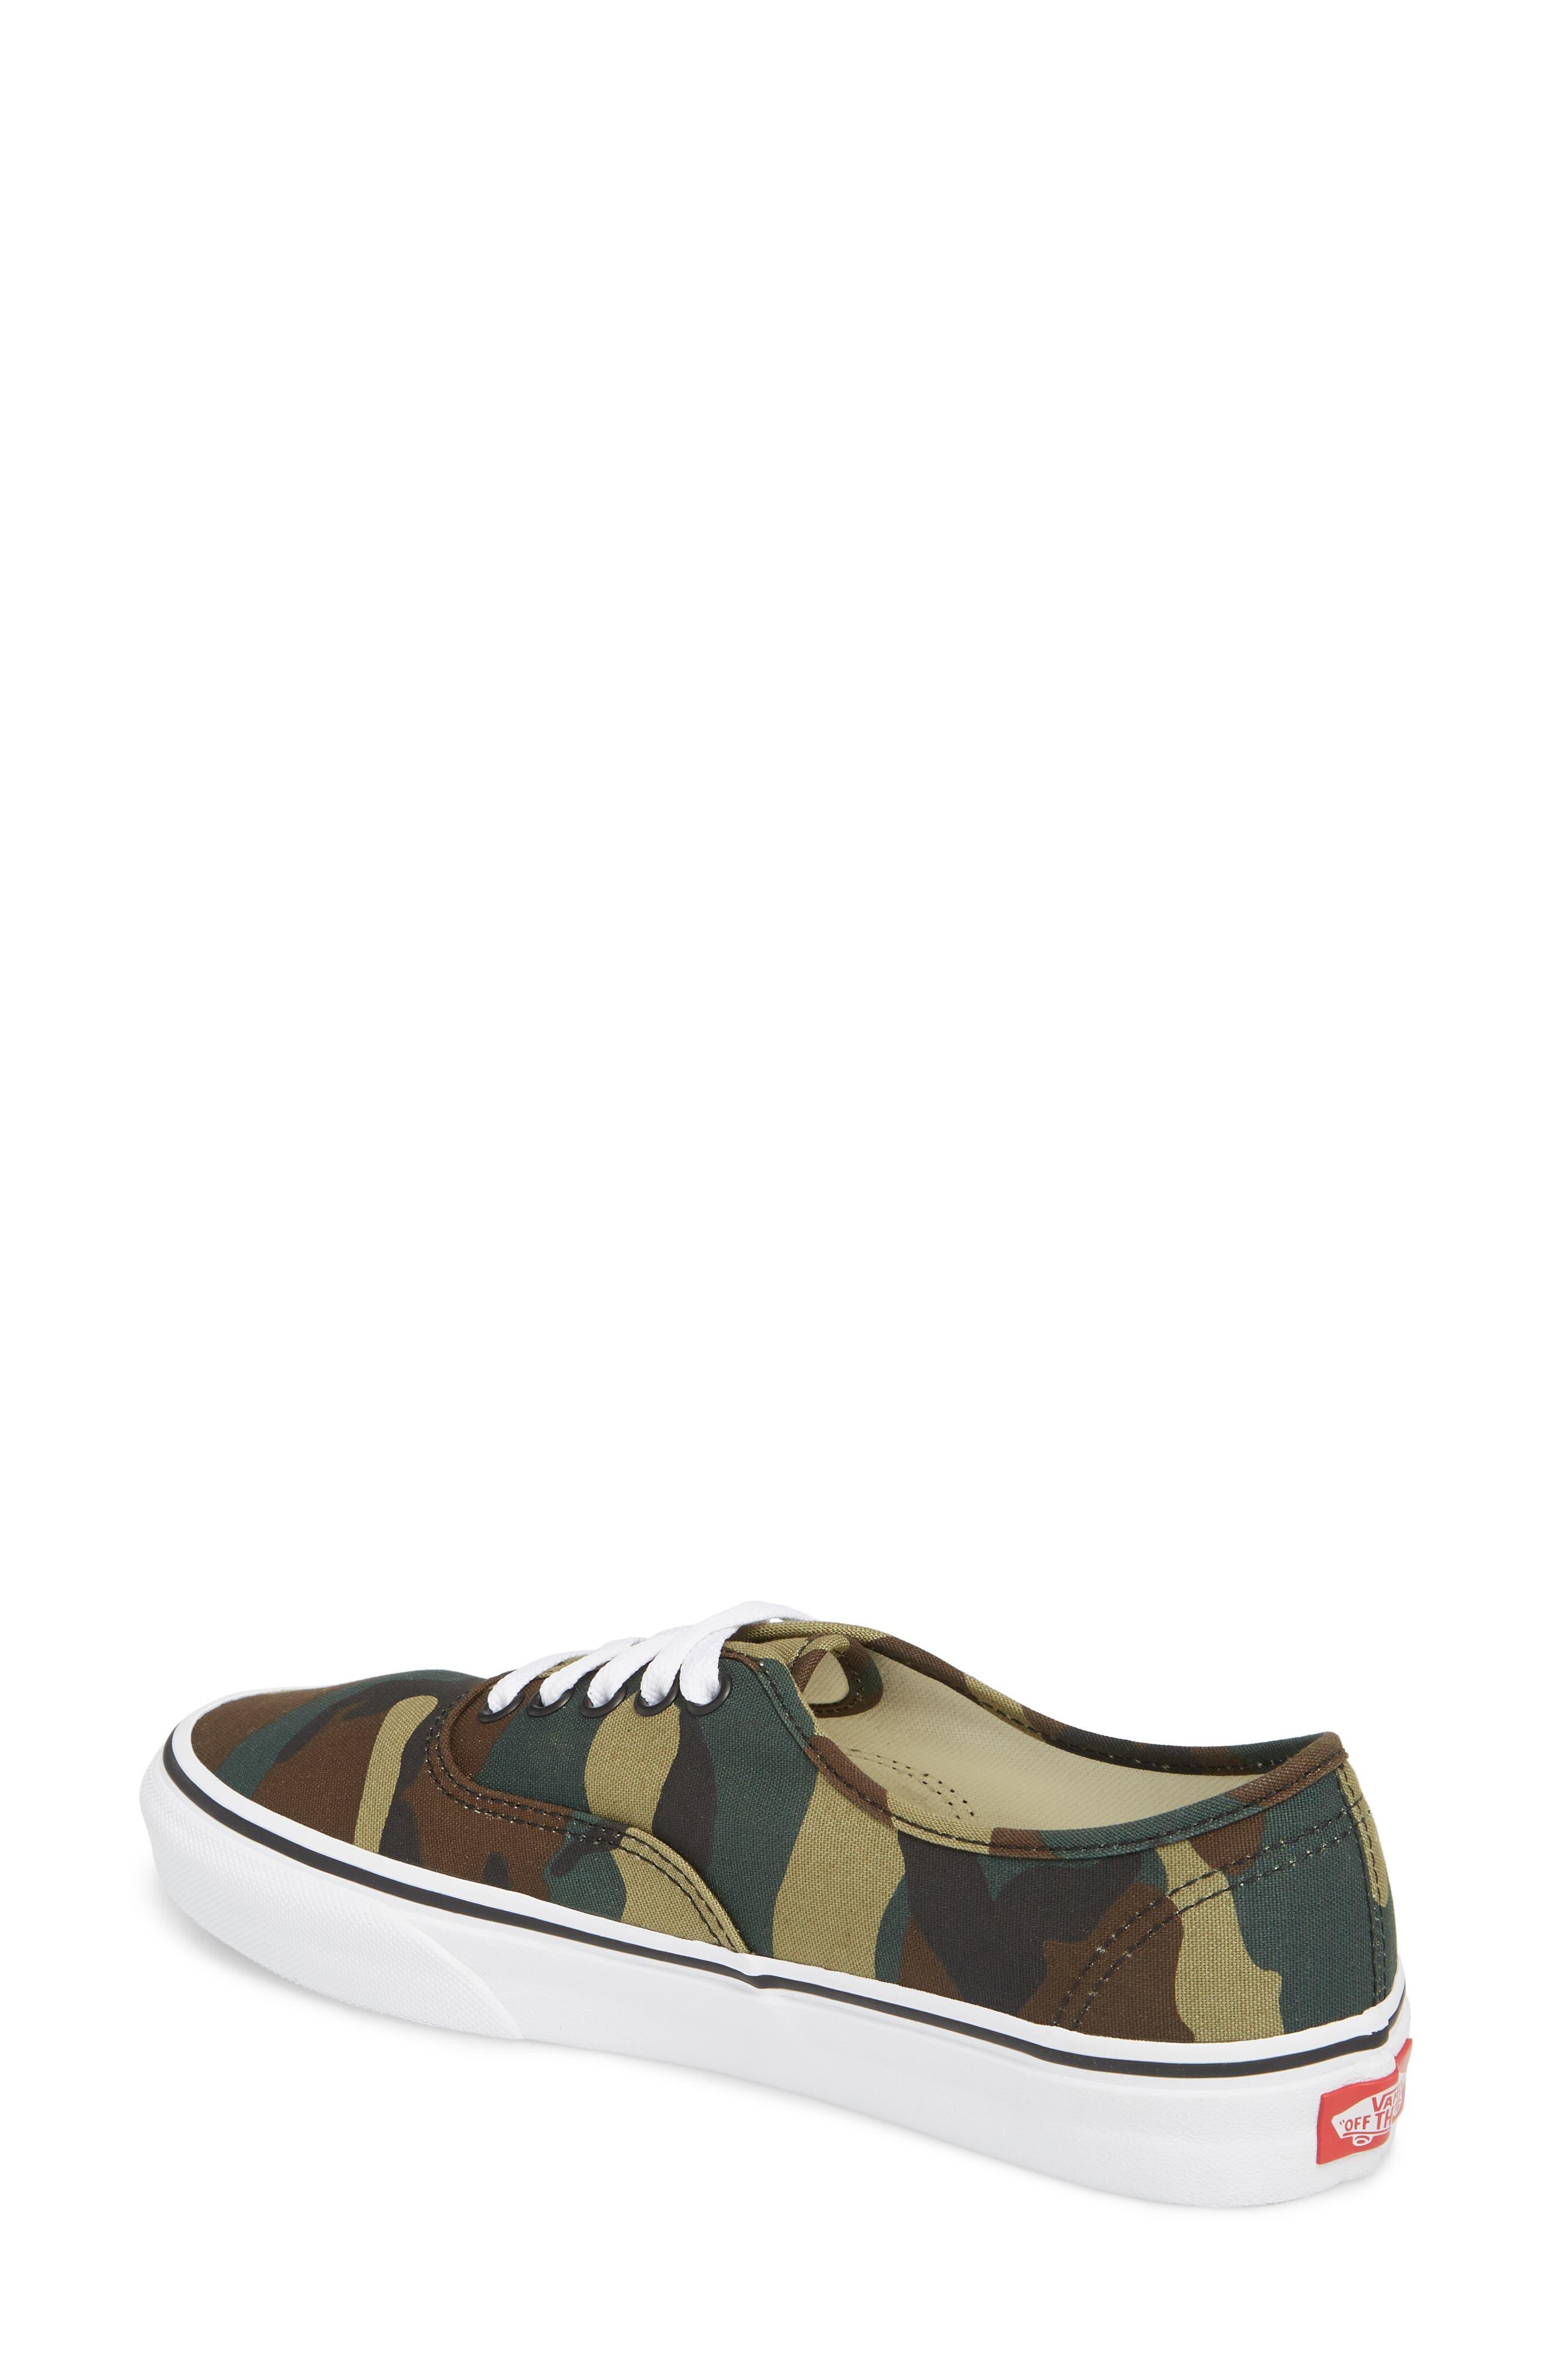 ,                             'Authentic' Sneaker,                             Alternate thumbnail 272, color,                             305